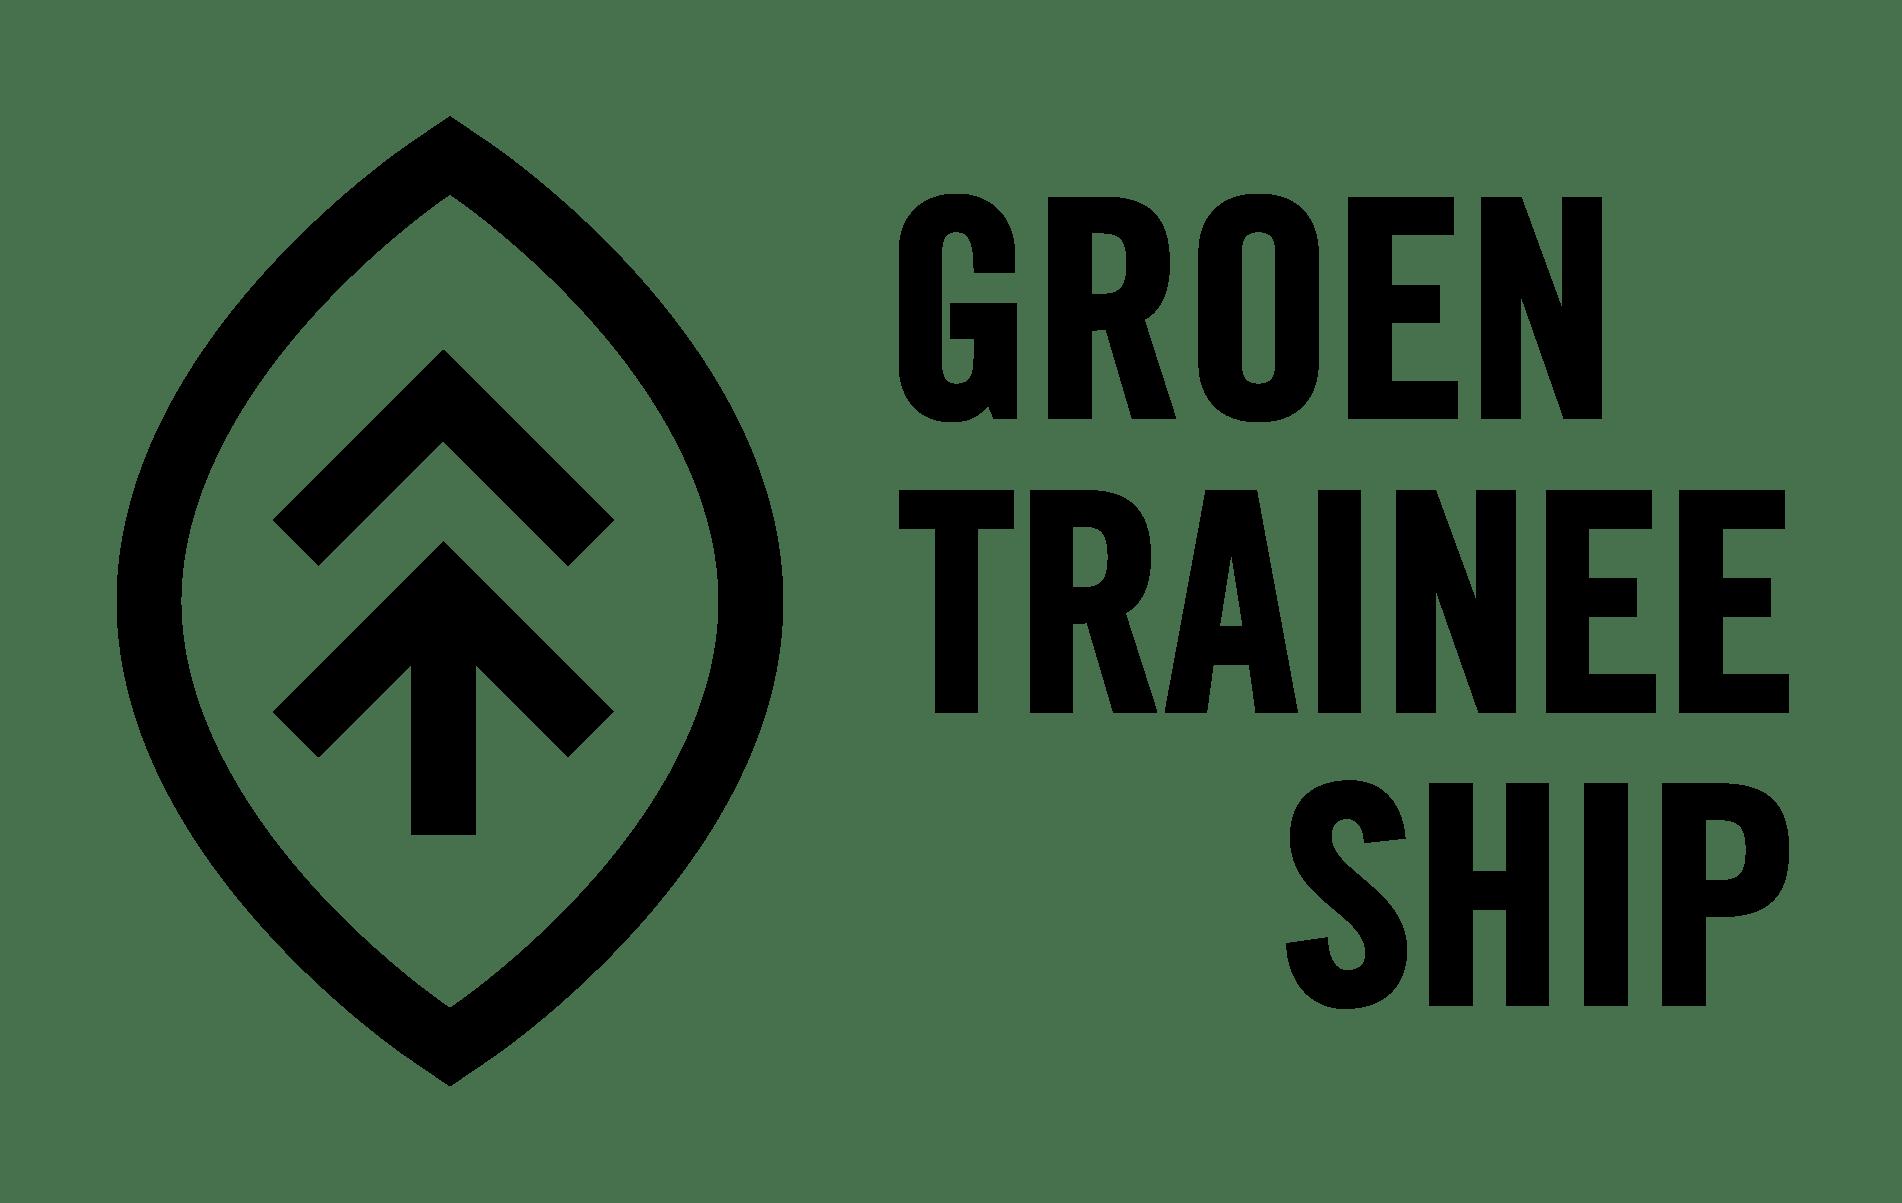 Groen Traineeship